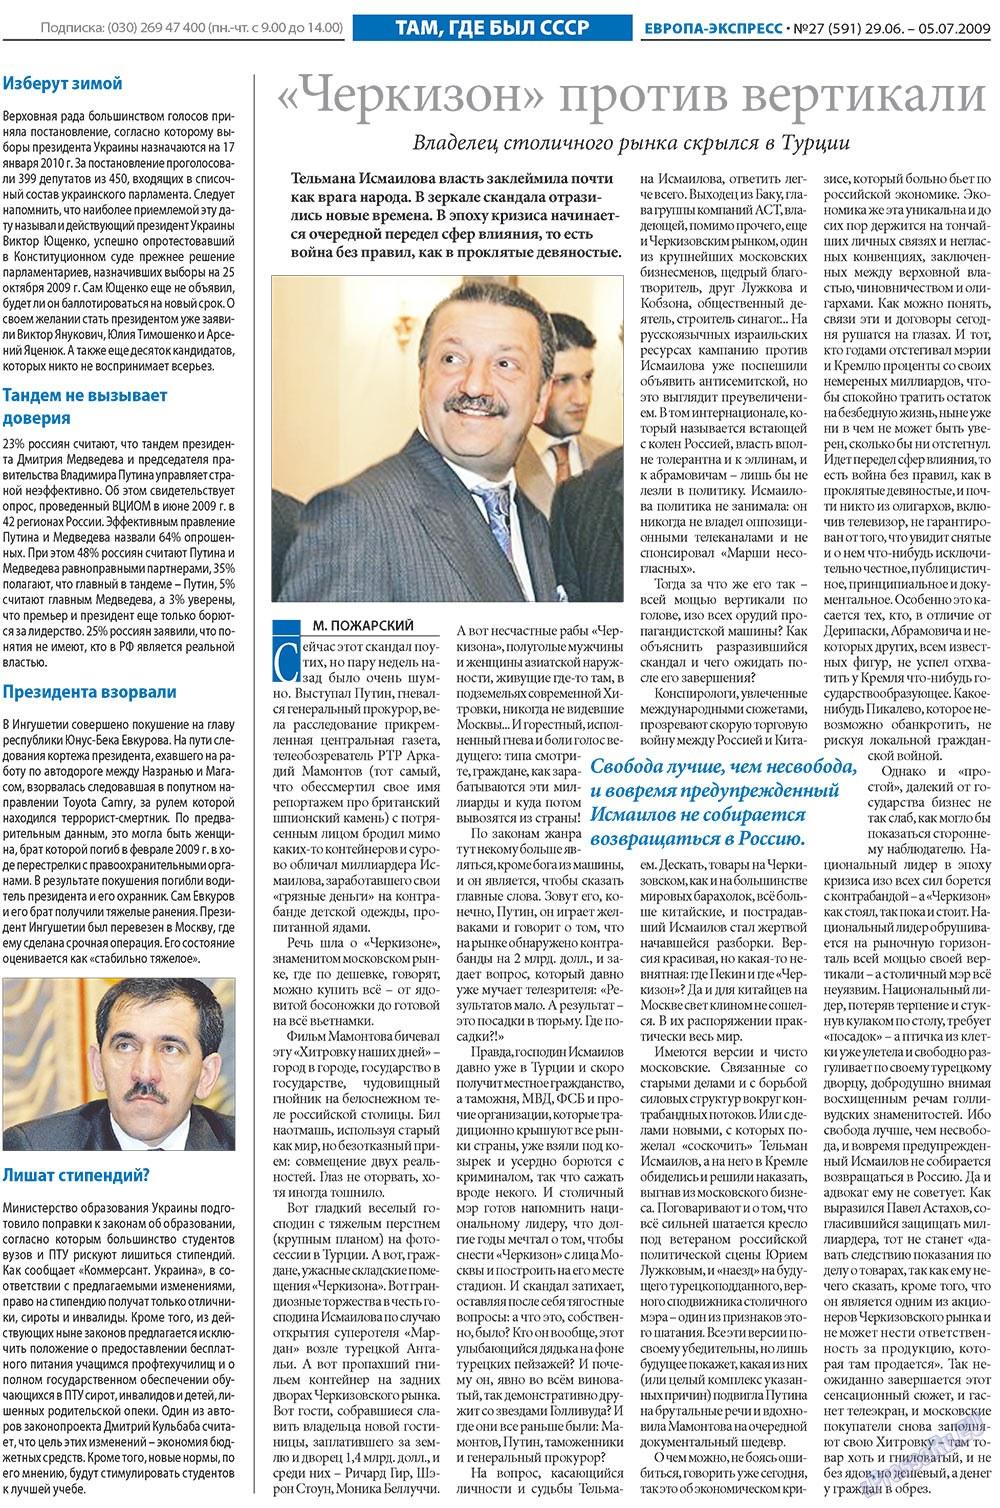 Европа экспресс (газета). 2009 год, номер 27, стр. 11